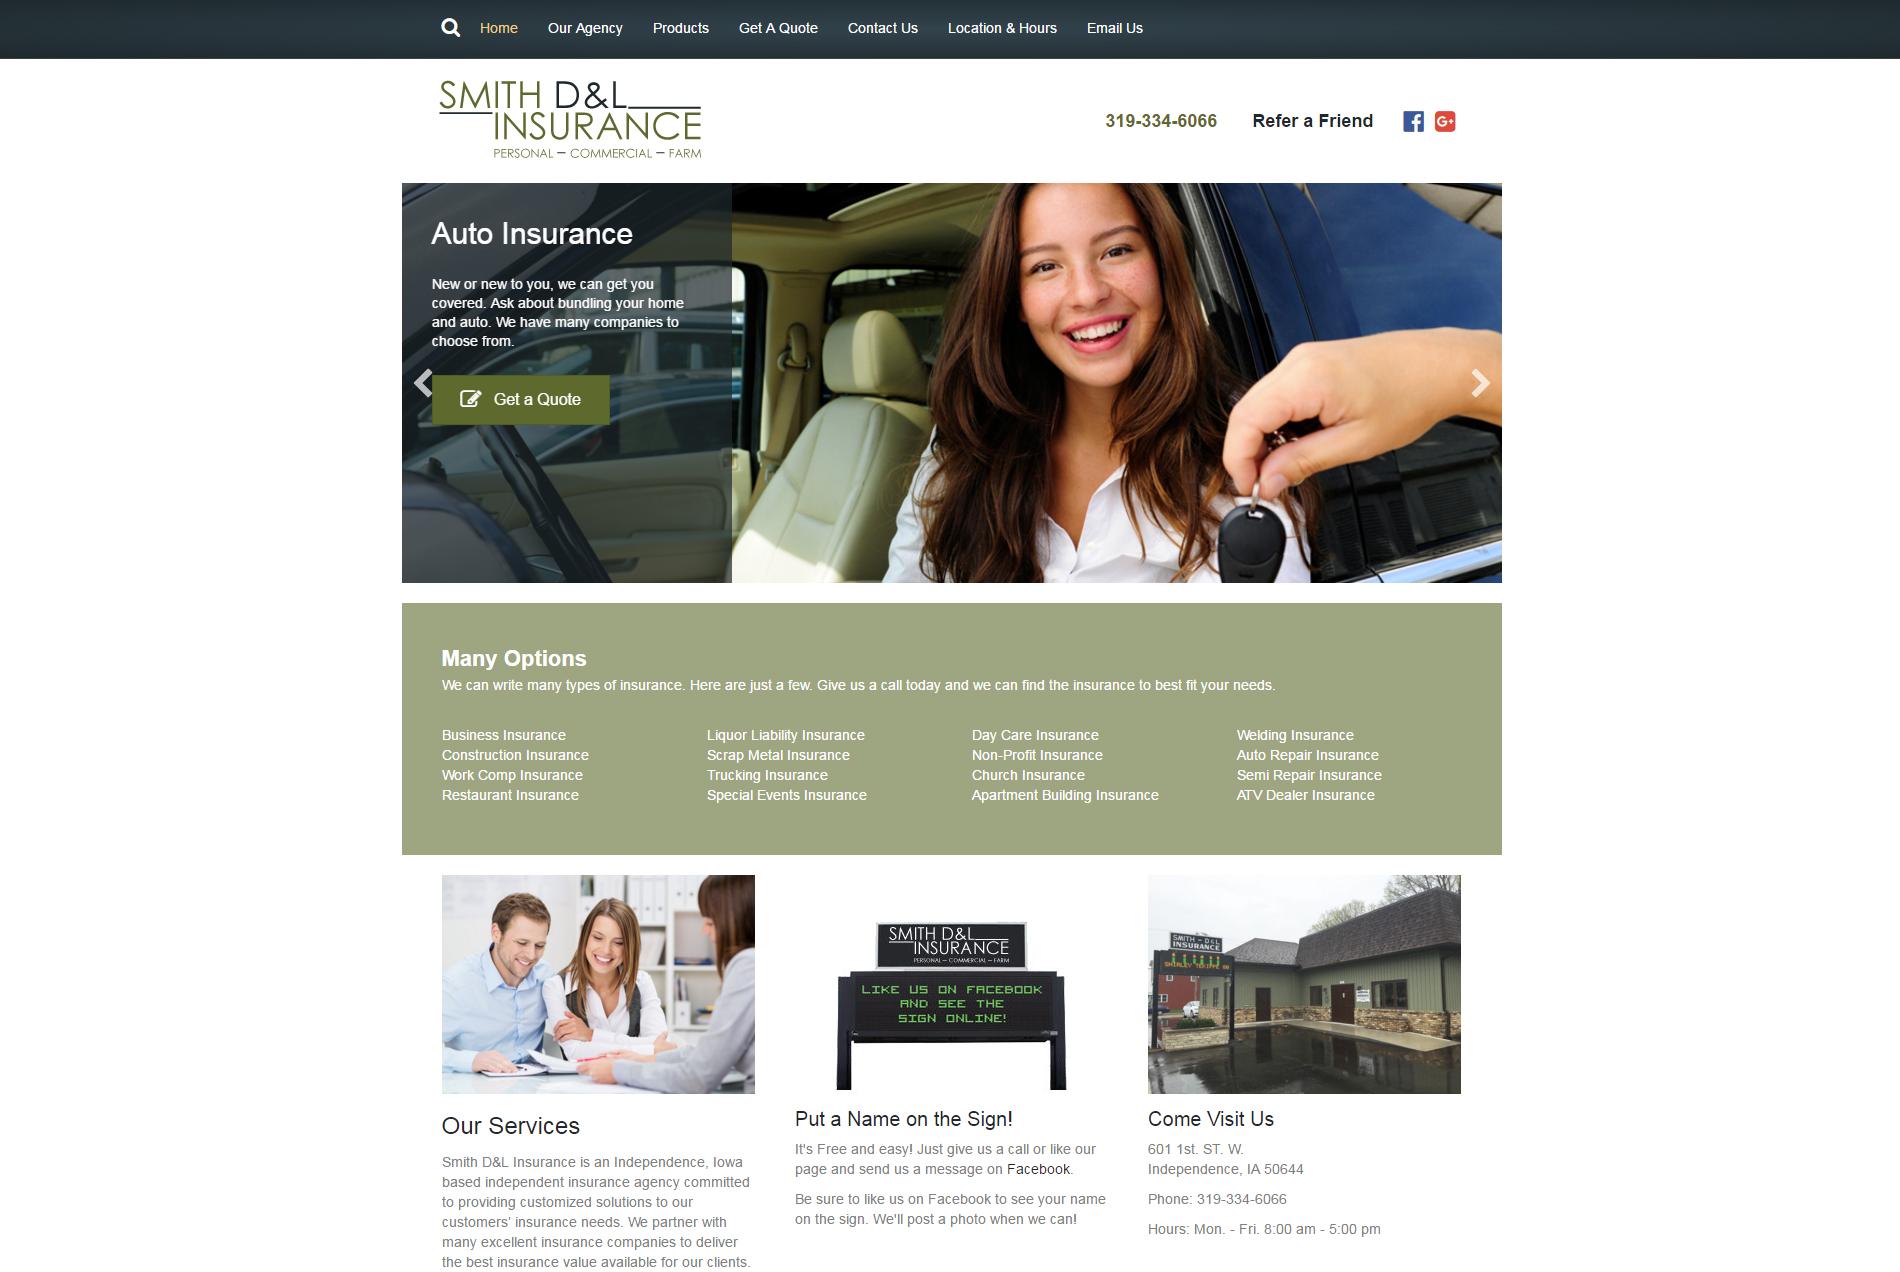 Smith D&L Insurance - Website